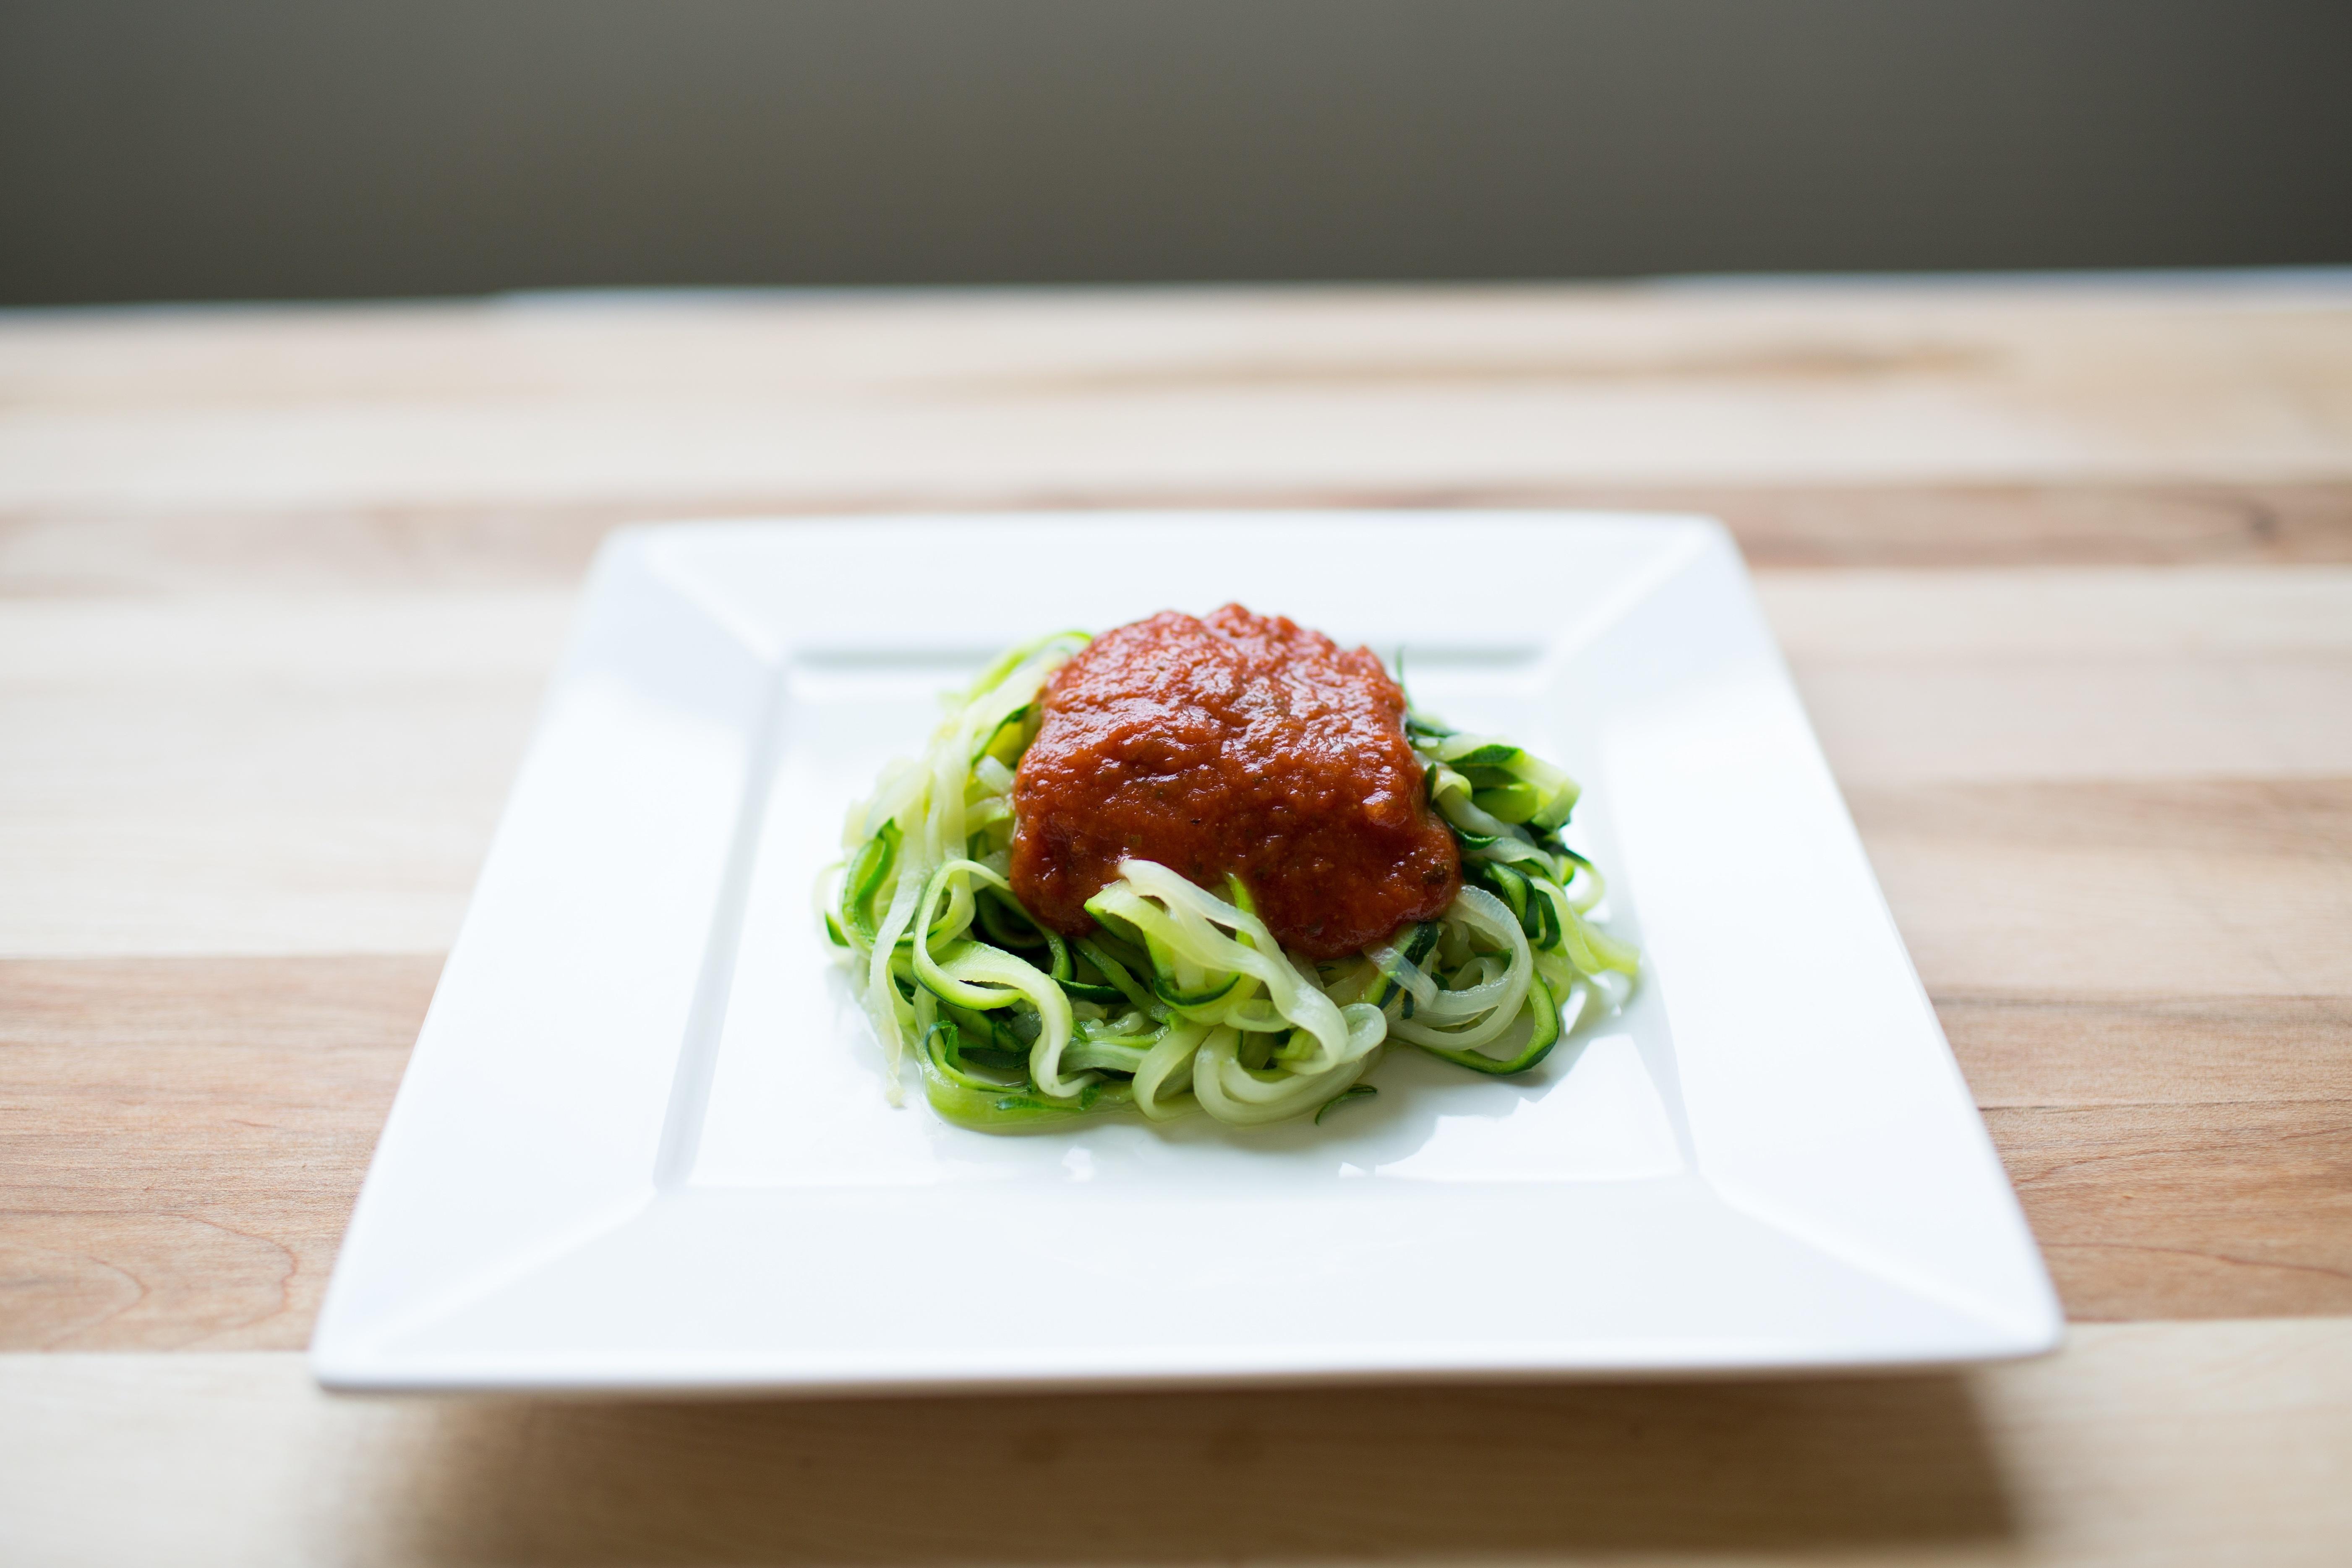 Zucchini Noodles with Marinara Sauce